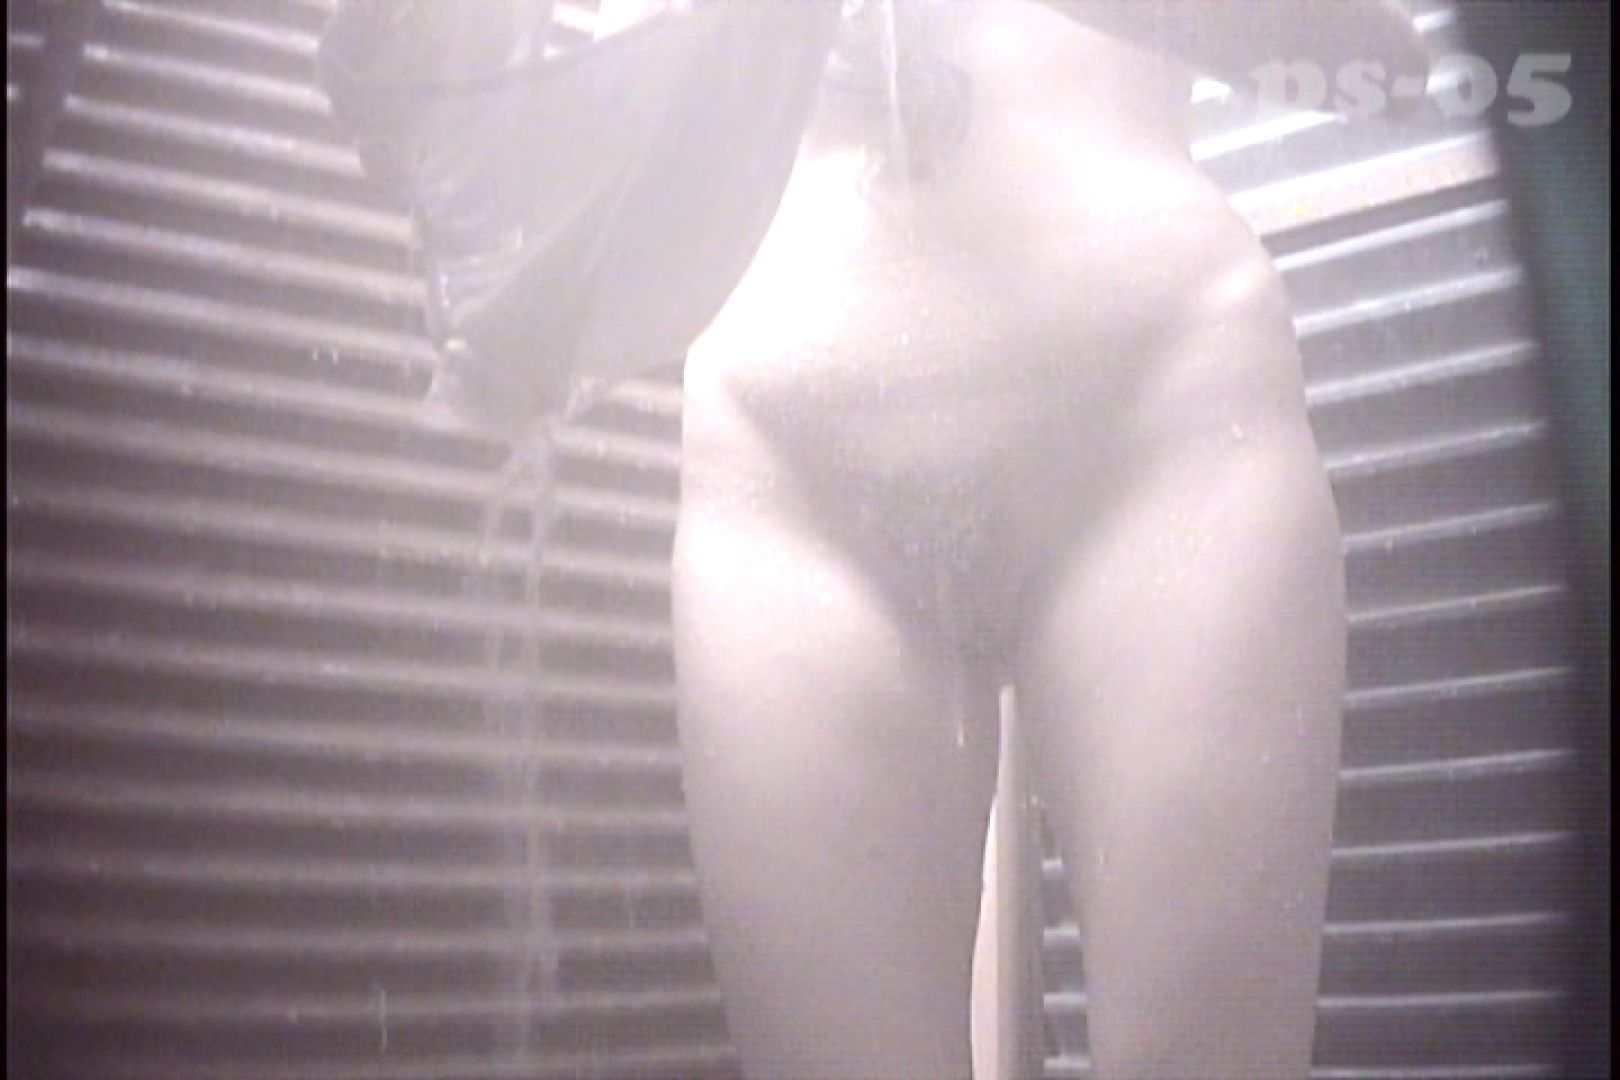 File.31 出ました陰茎!見えちゃってます!! 名人 おまんこ動画流出 61画像 27